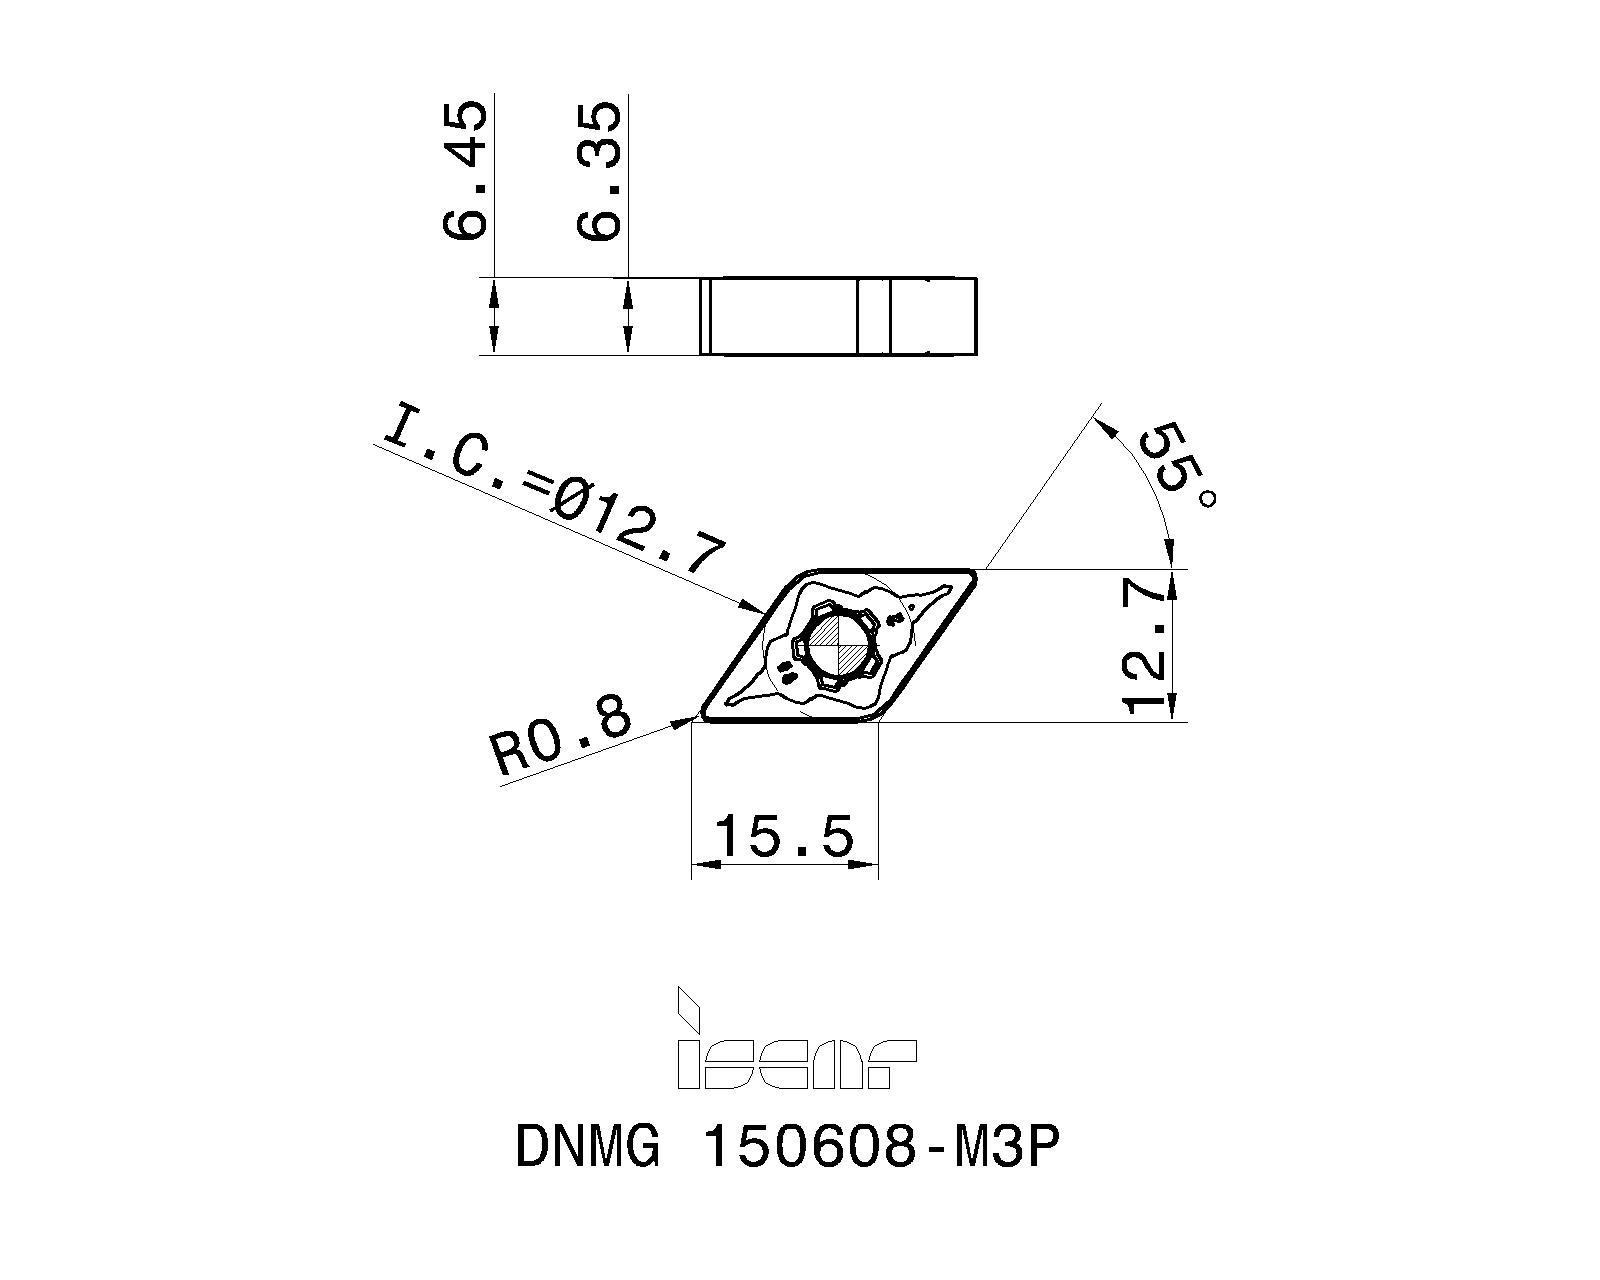 LOC860 DNMG 150608 MT TT5080 Details about  /Ingersoll Carbide Insert DNMG442MT